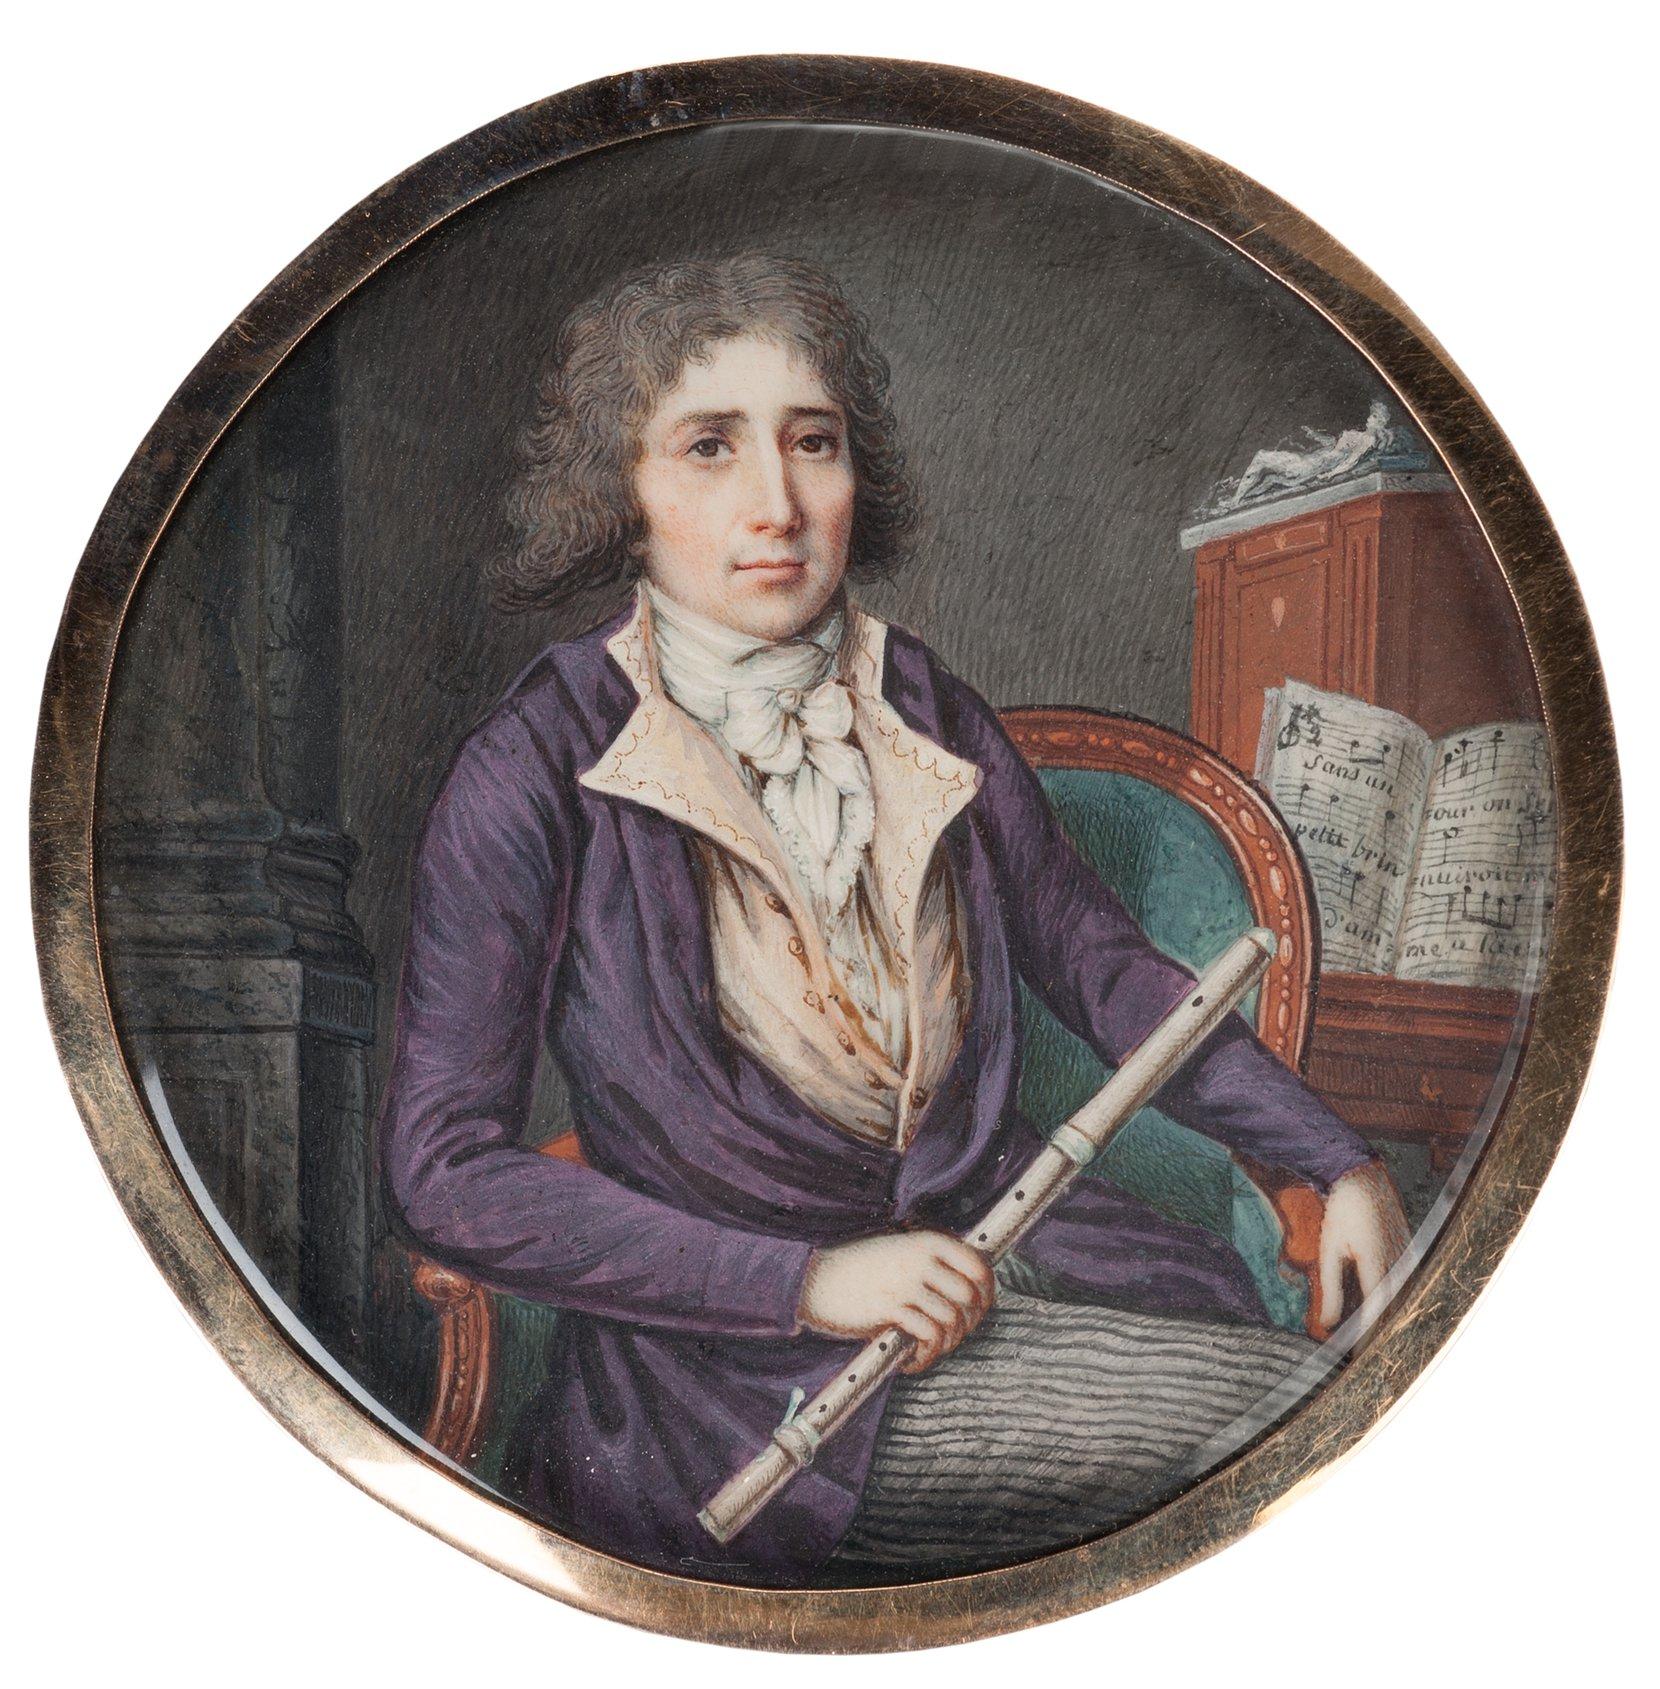 portrait of a flautist -- coer art painting